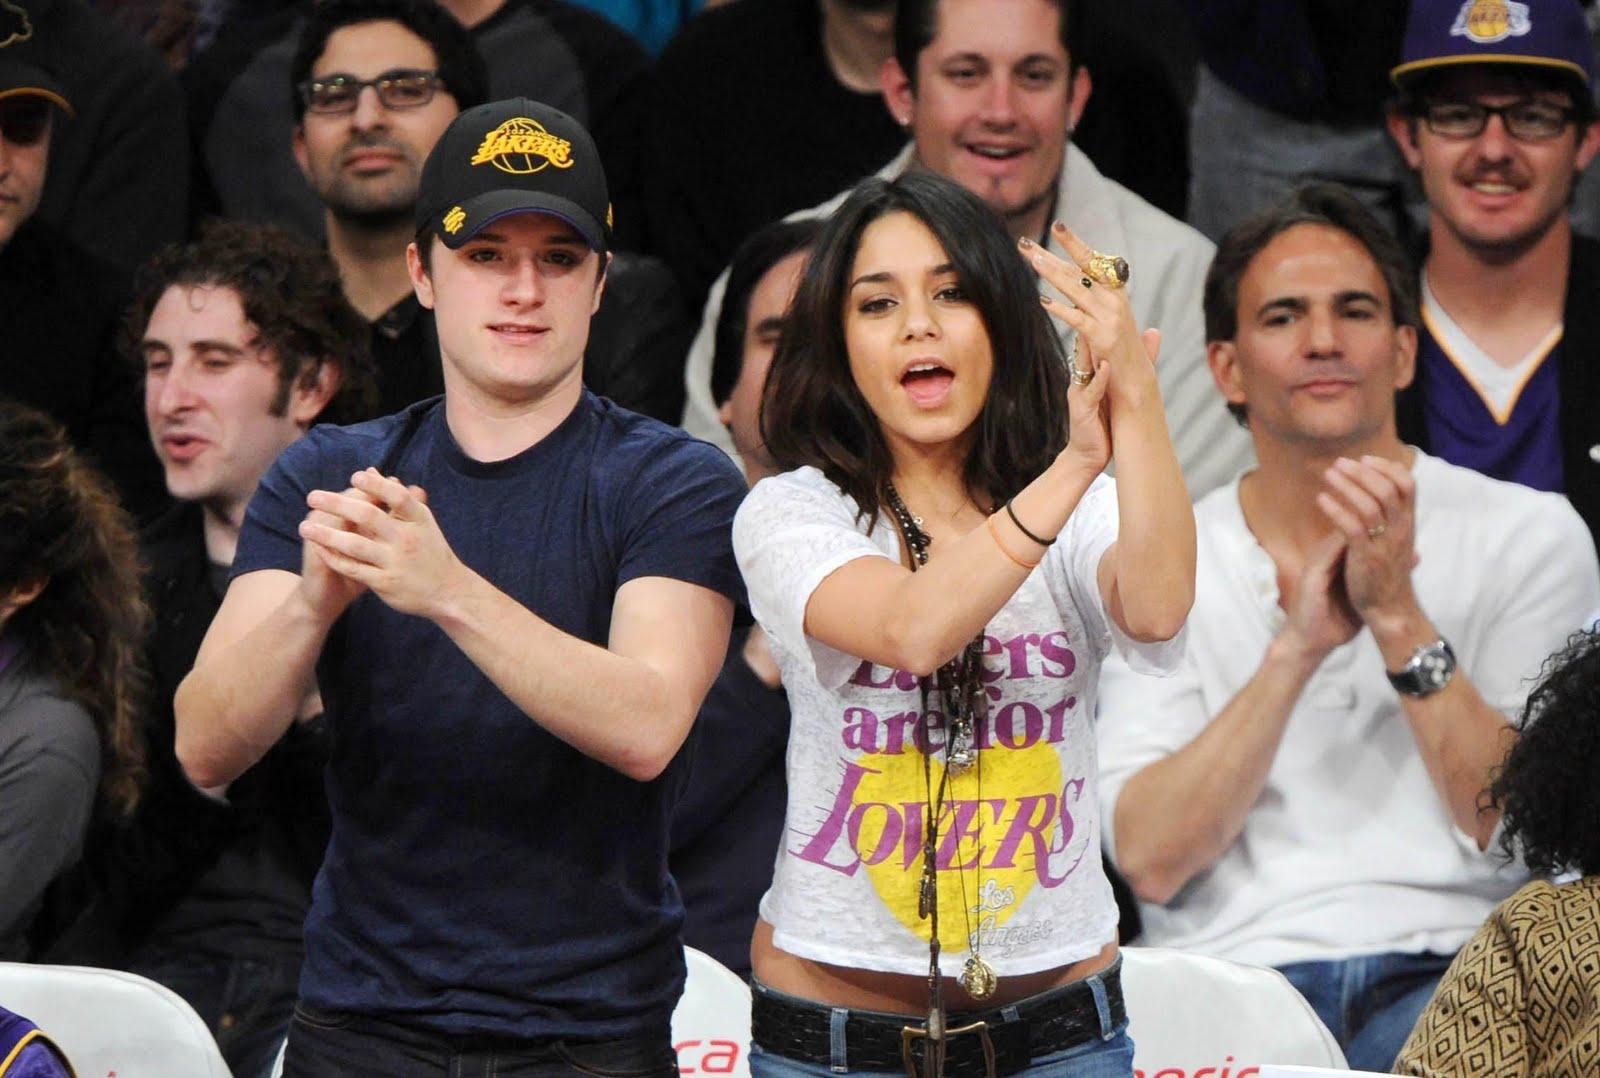 Robert Pattinson : Robert Pattinson et Kristen Stewart, Ian Somerhalder et Nina Dobrev : Ces